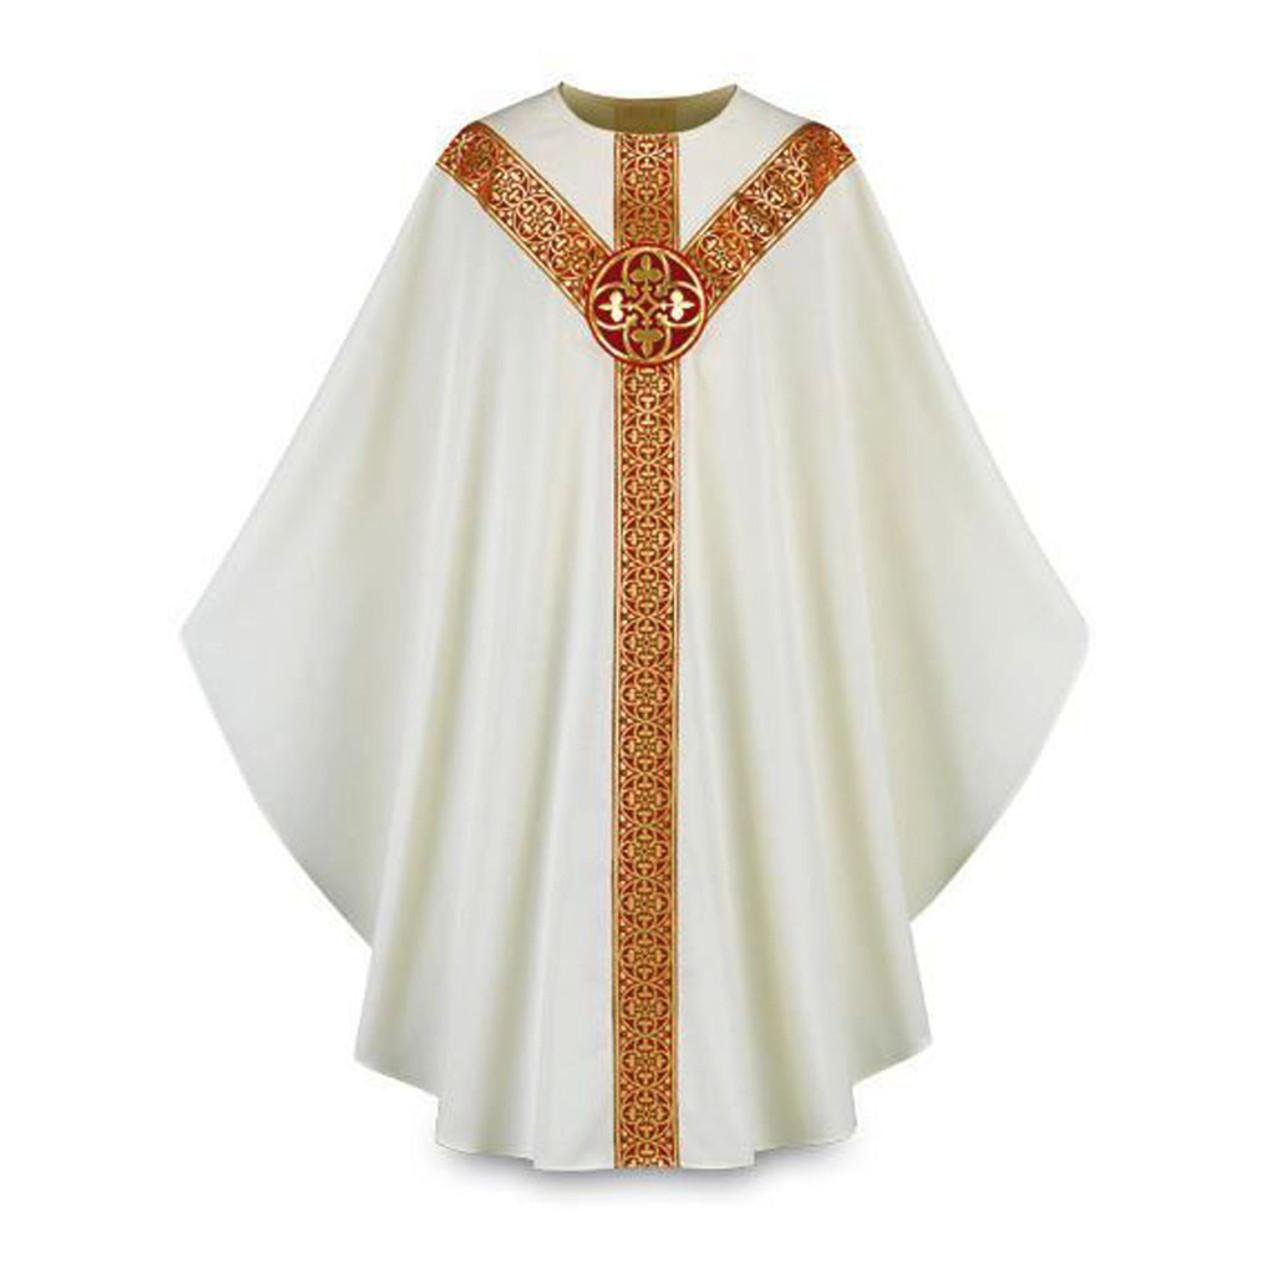 3639 Beige Chasuble in Brugia